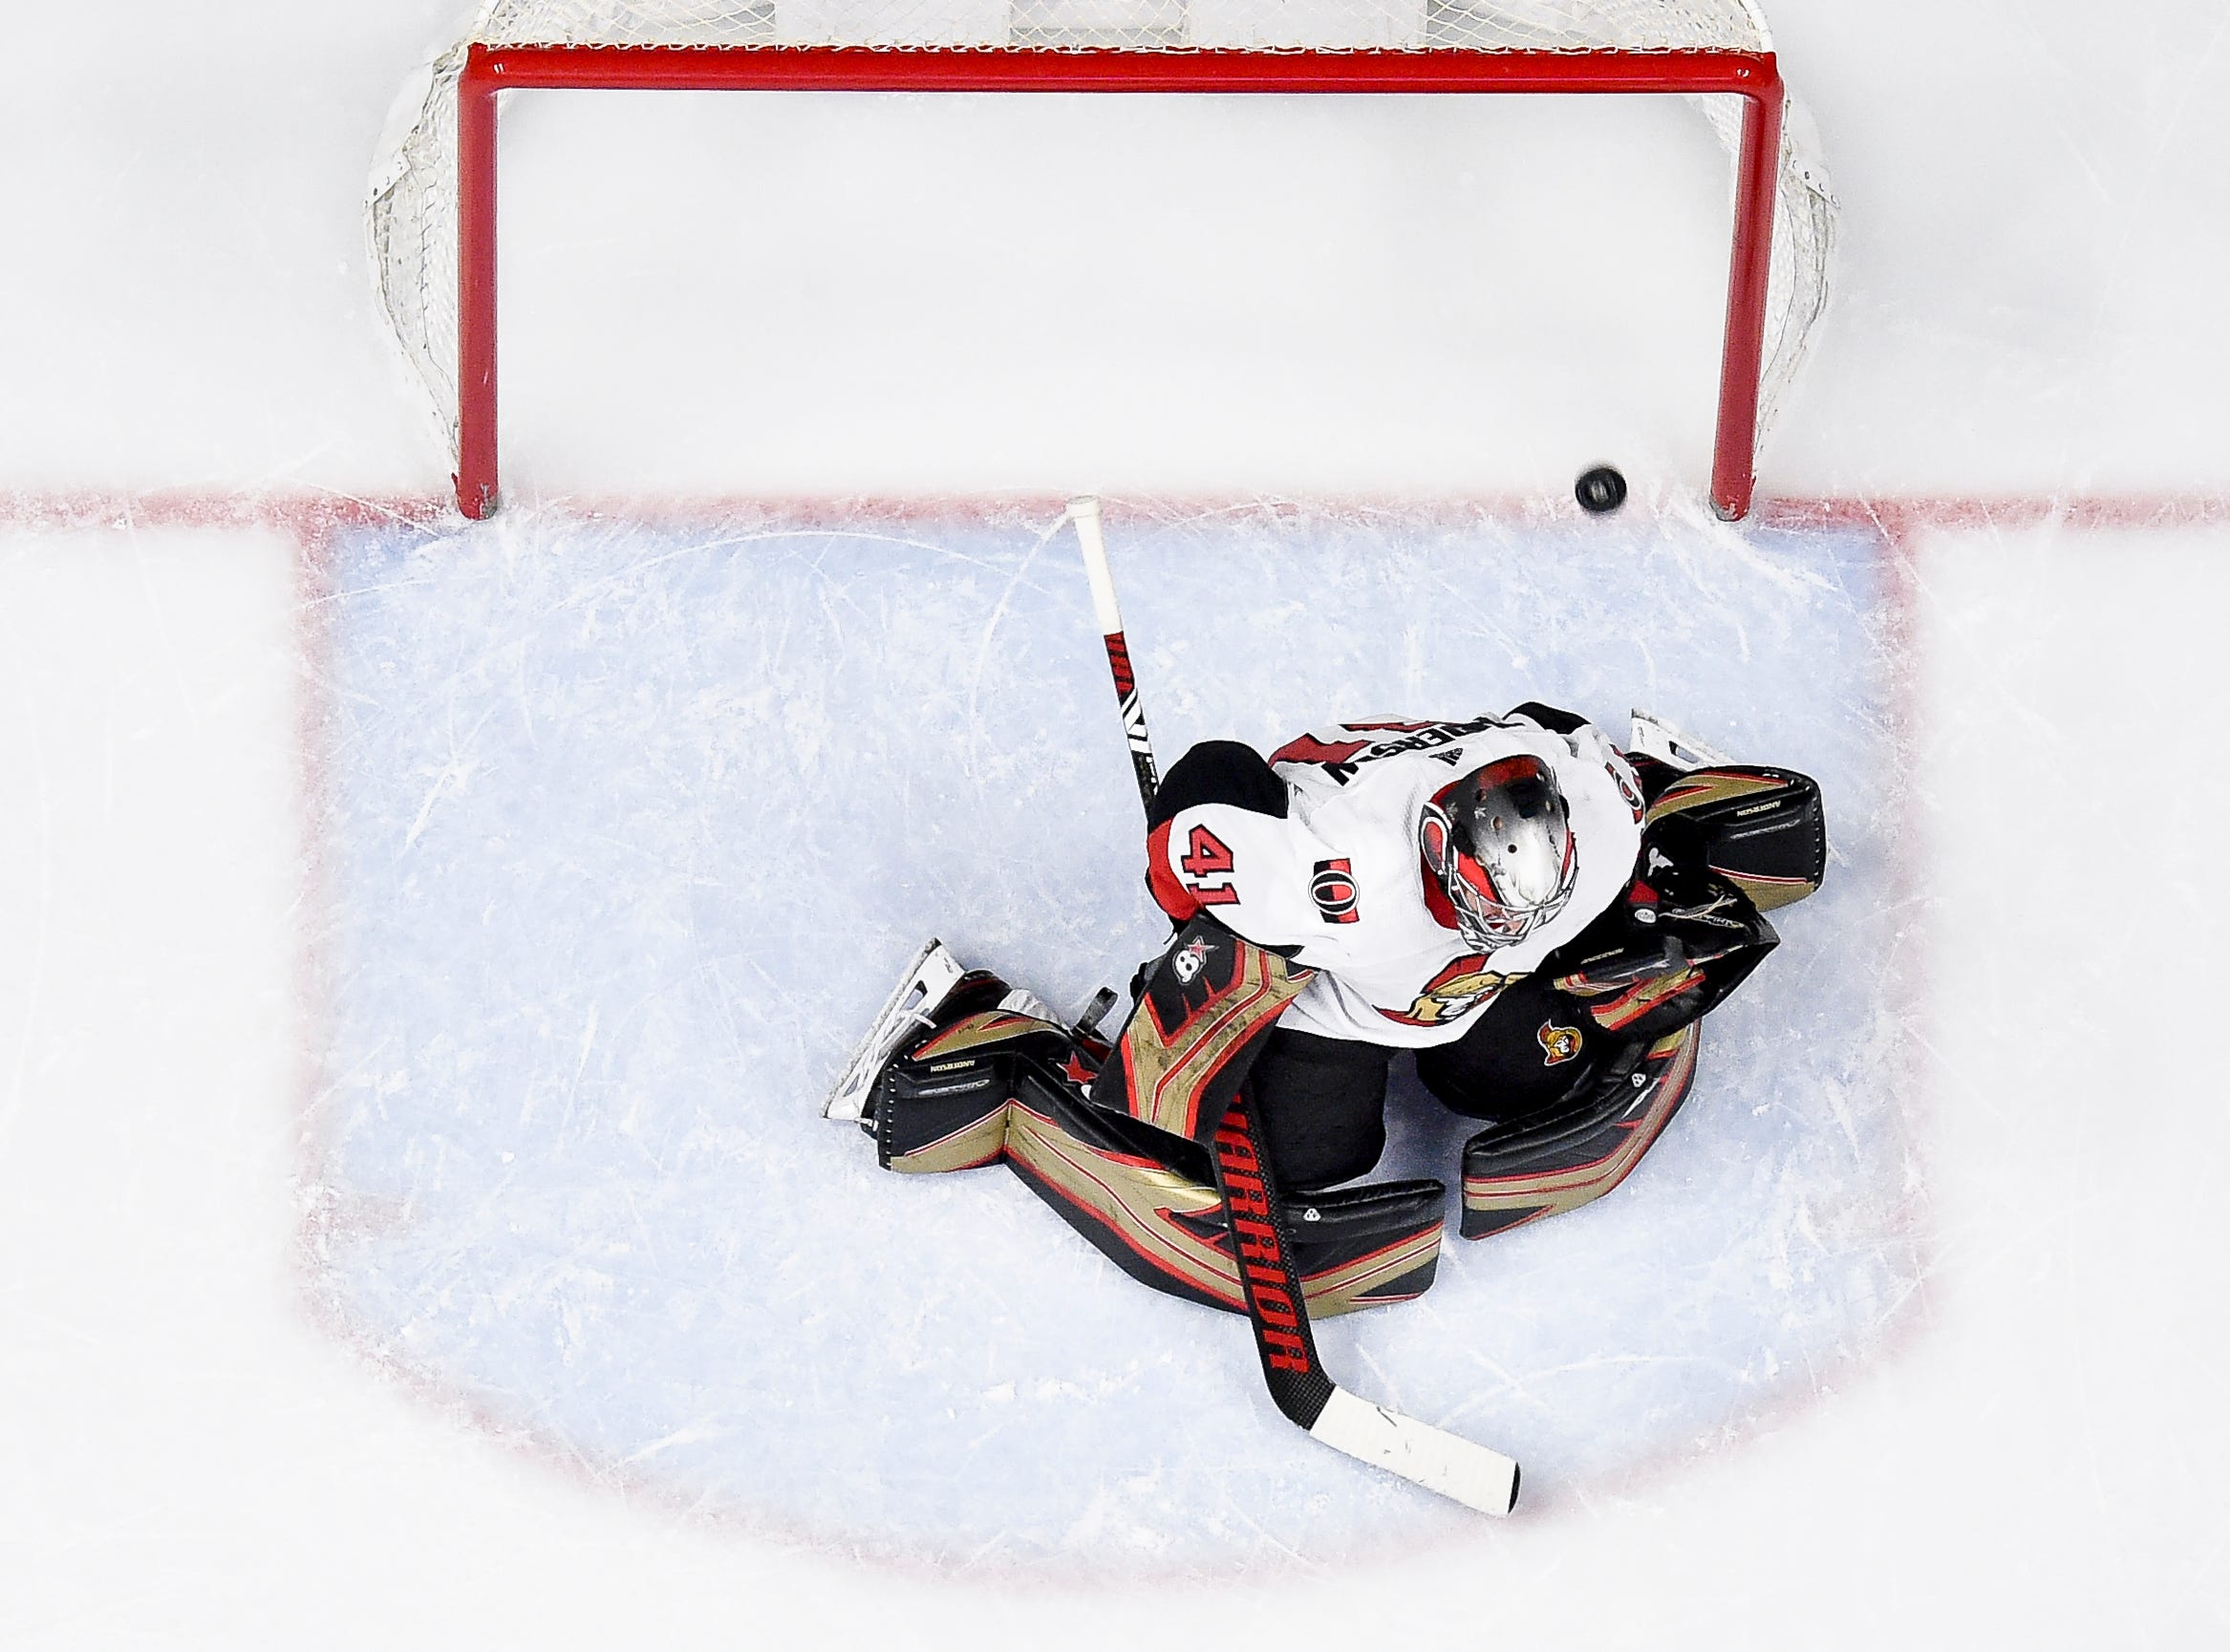 Nashville Predators defenseman Ryan Ellis scores a goal past Ottawa Senators goaltender Craig Anderson (41) during the second period at Bridgestone Arena in Nashville, Tenn., Tuesday, Dec. 11, 2018.